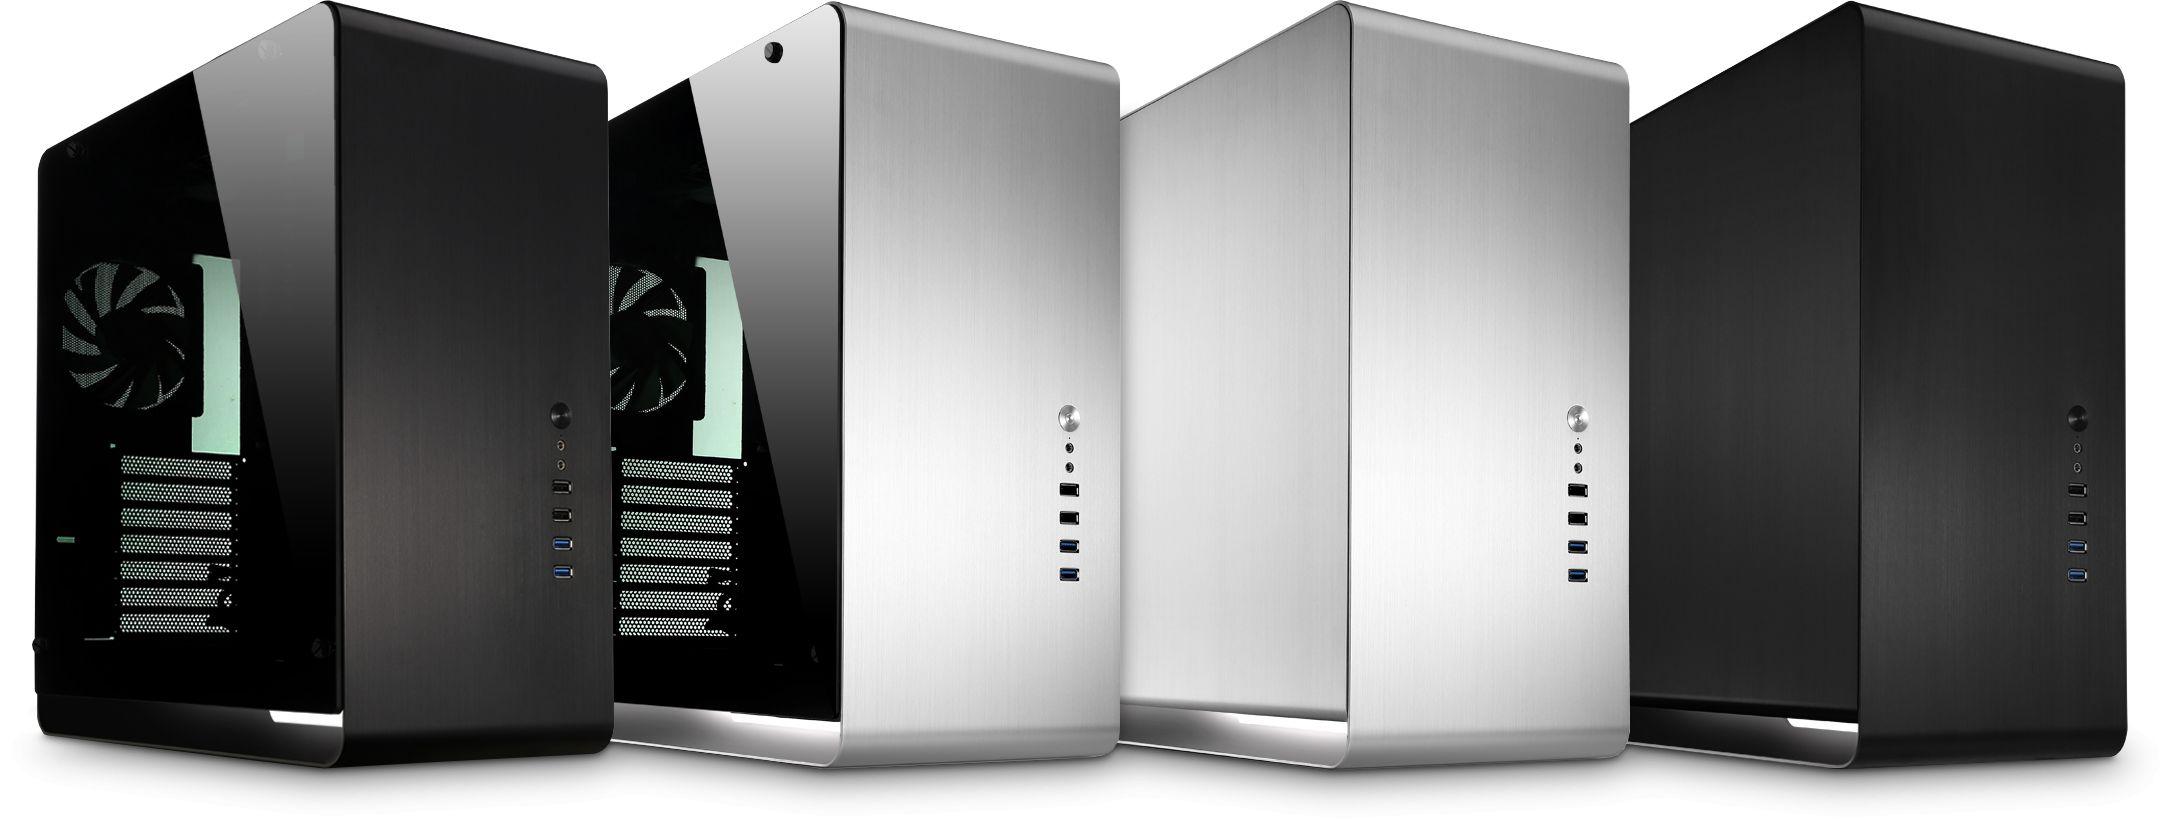 Jonsbo UMX4 Zone Compact Midi Tower Aluminium Cases